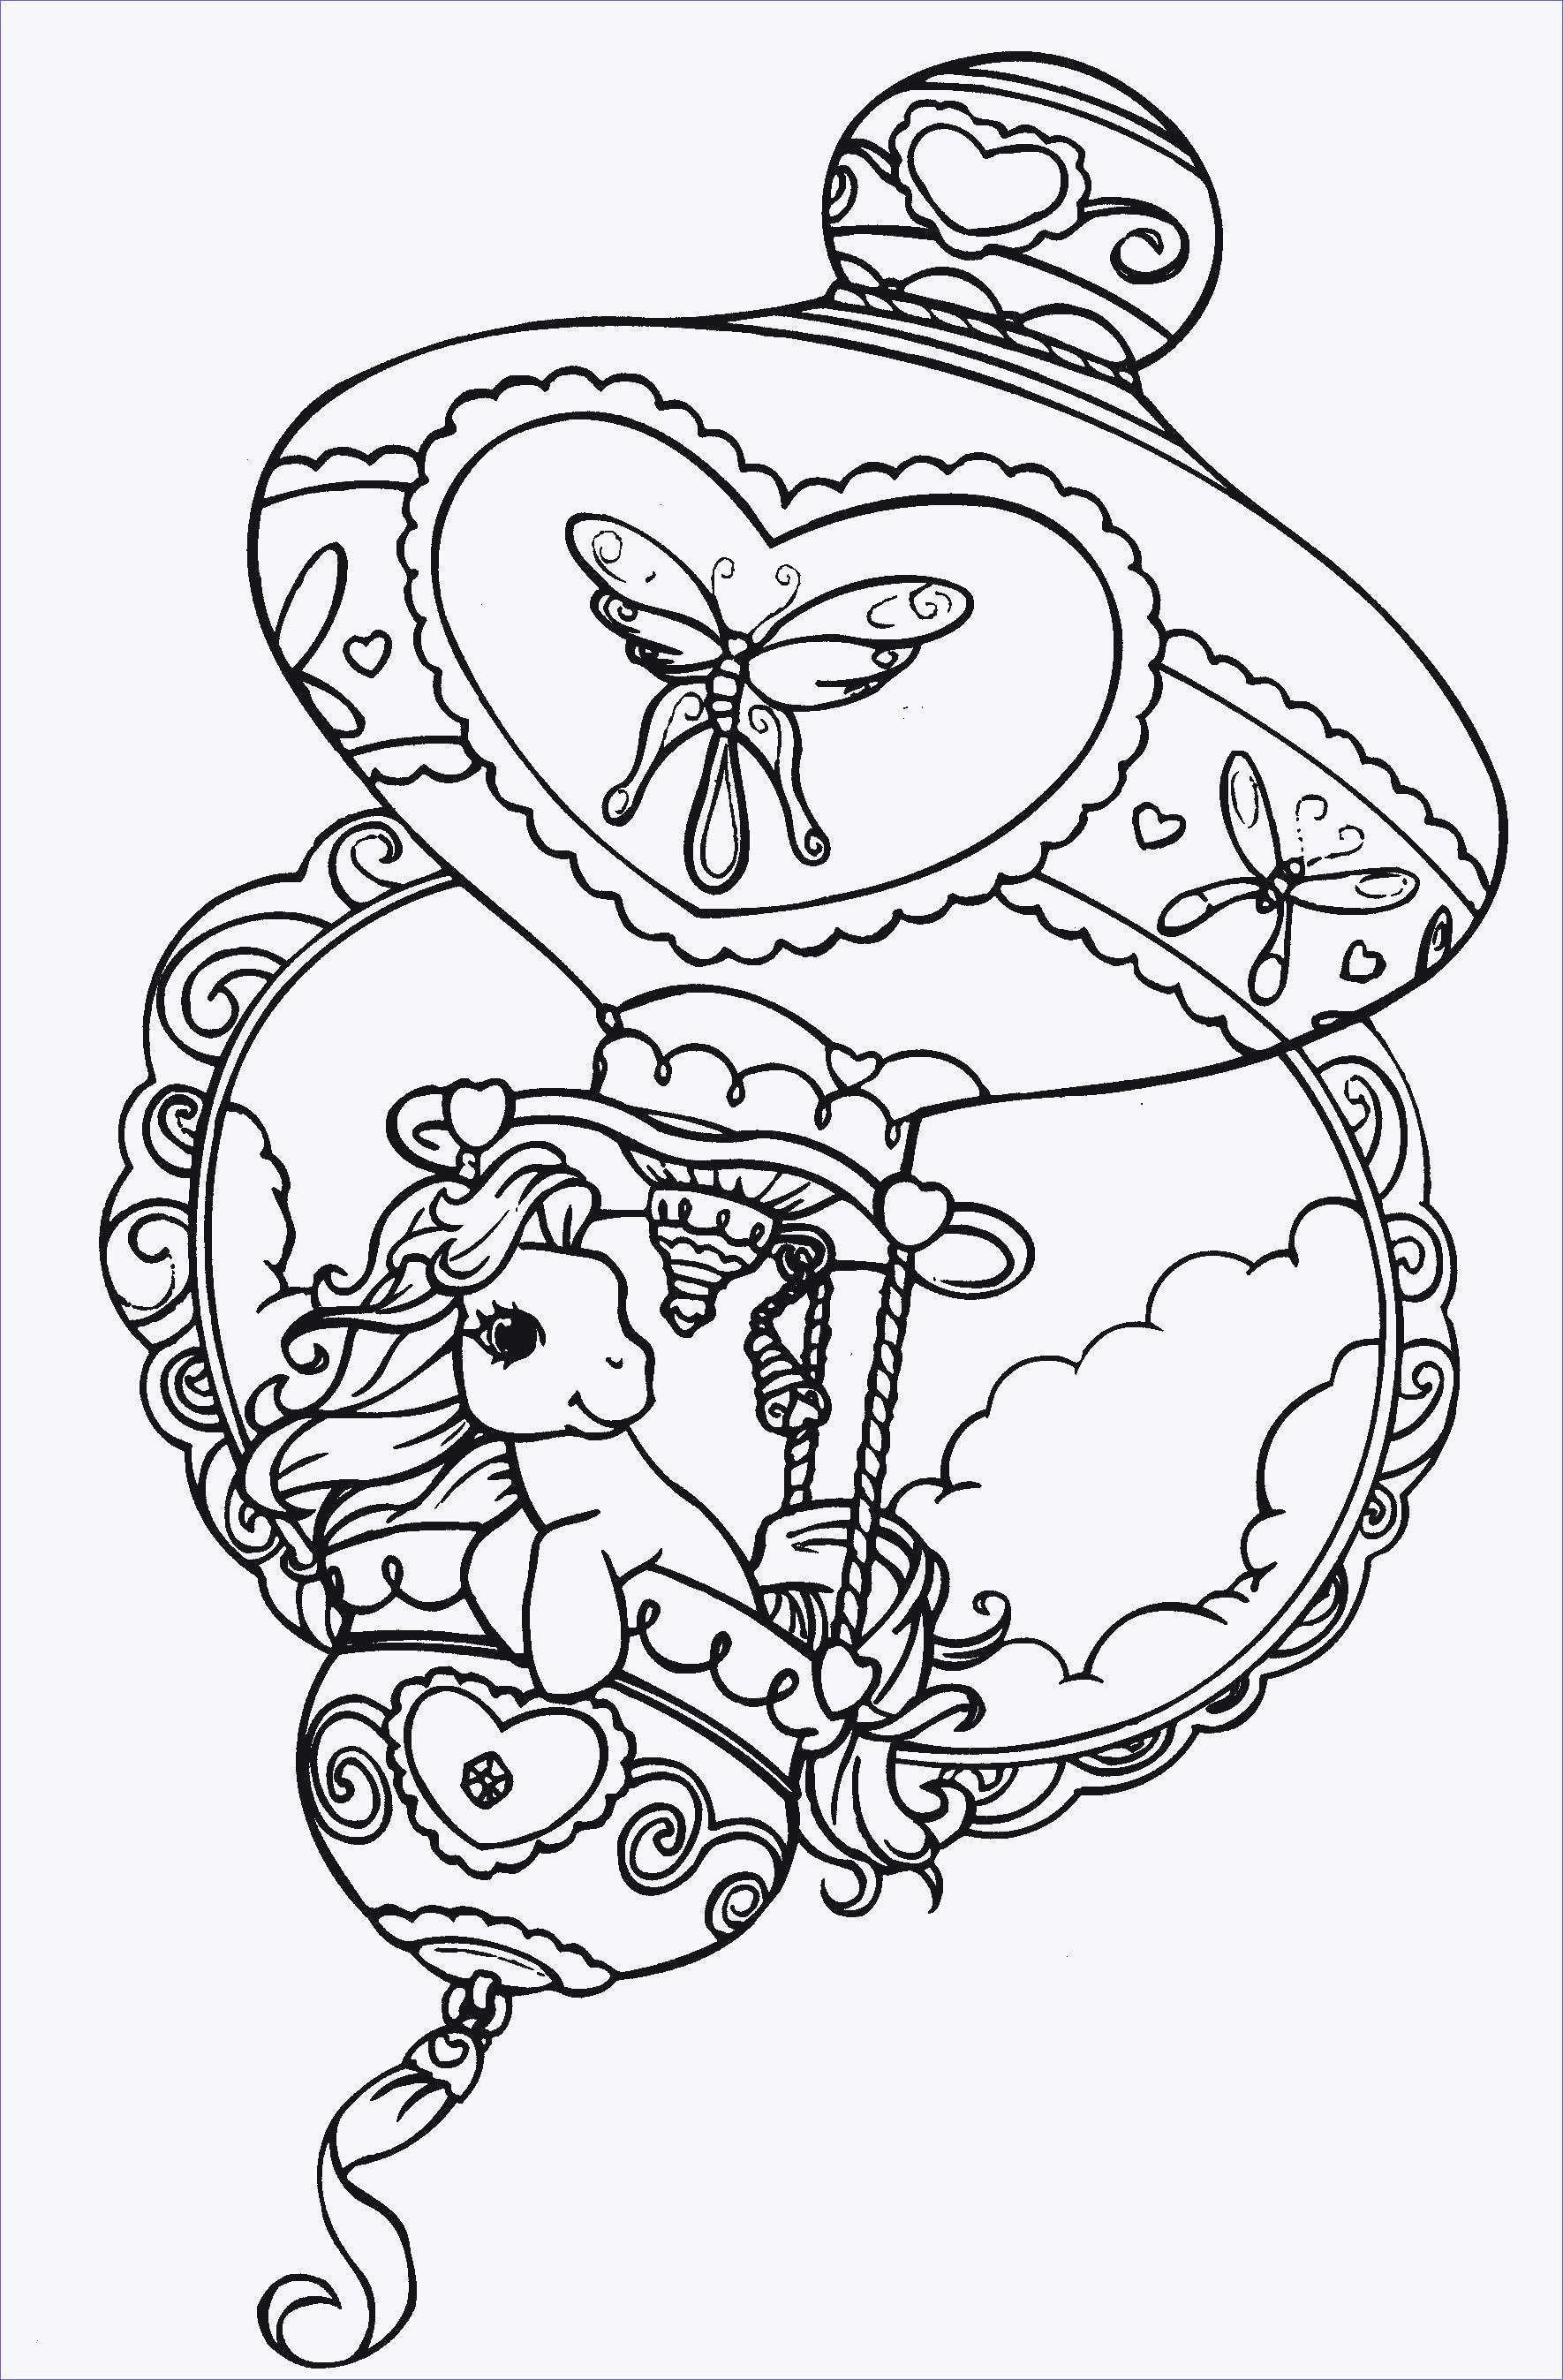 My Little Pony Rainbow Dash Ausmalbilder Genial My Little Pony Ausmalbilder Inspirierend Equestria Girl Ausmalbilder Galerie